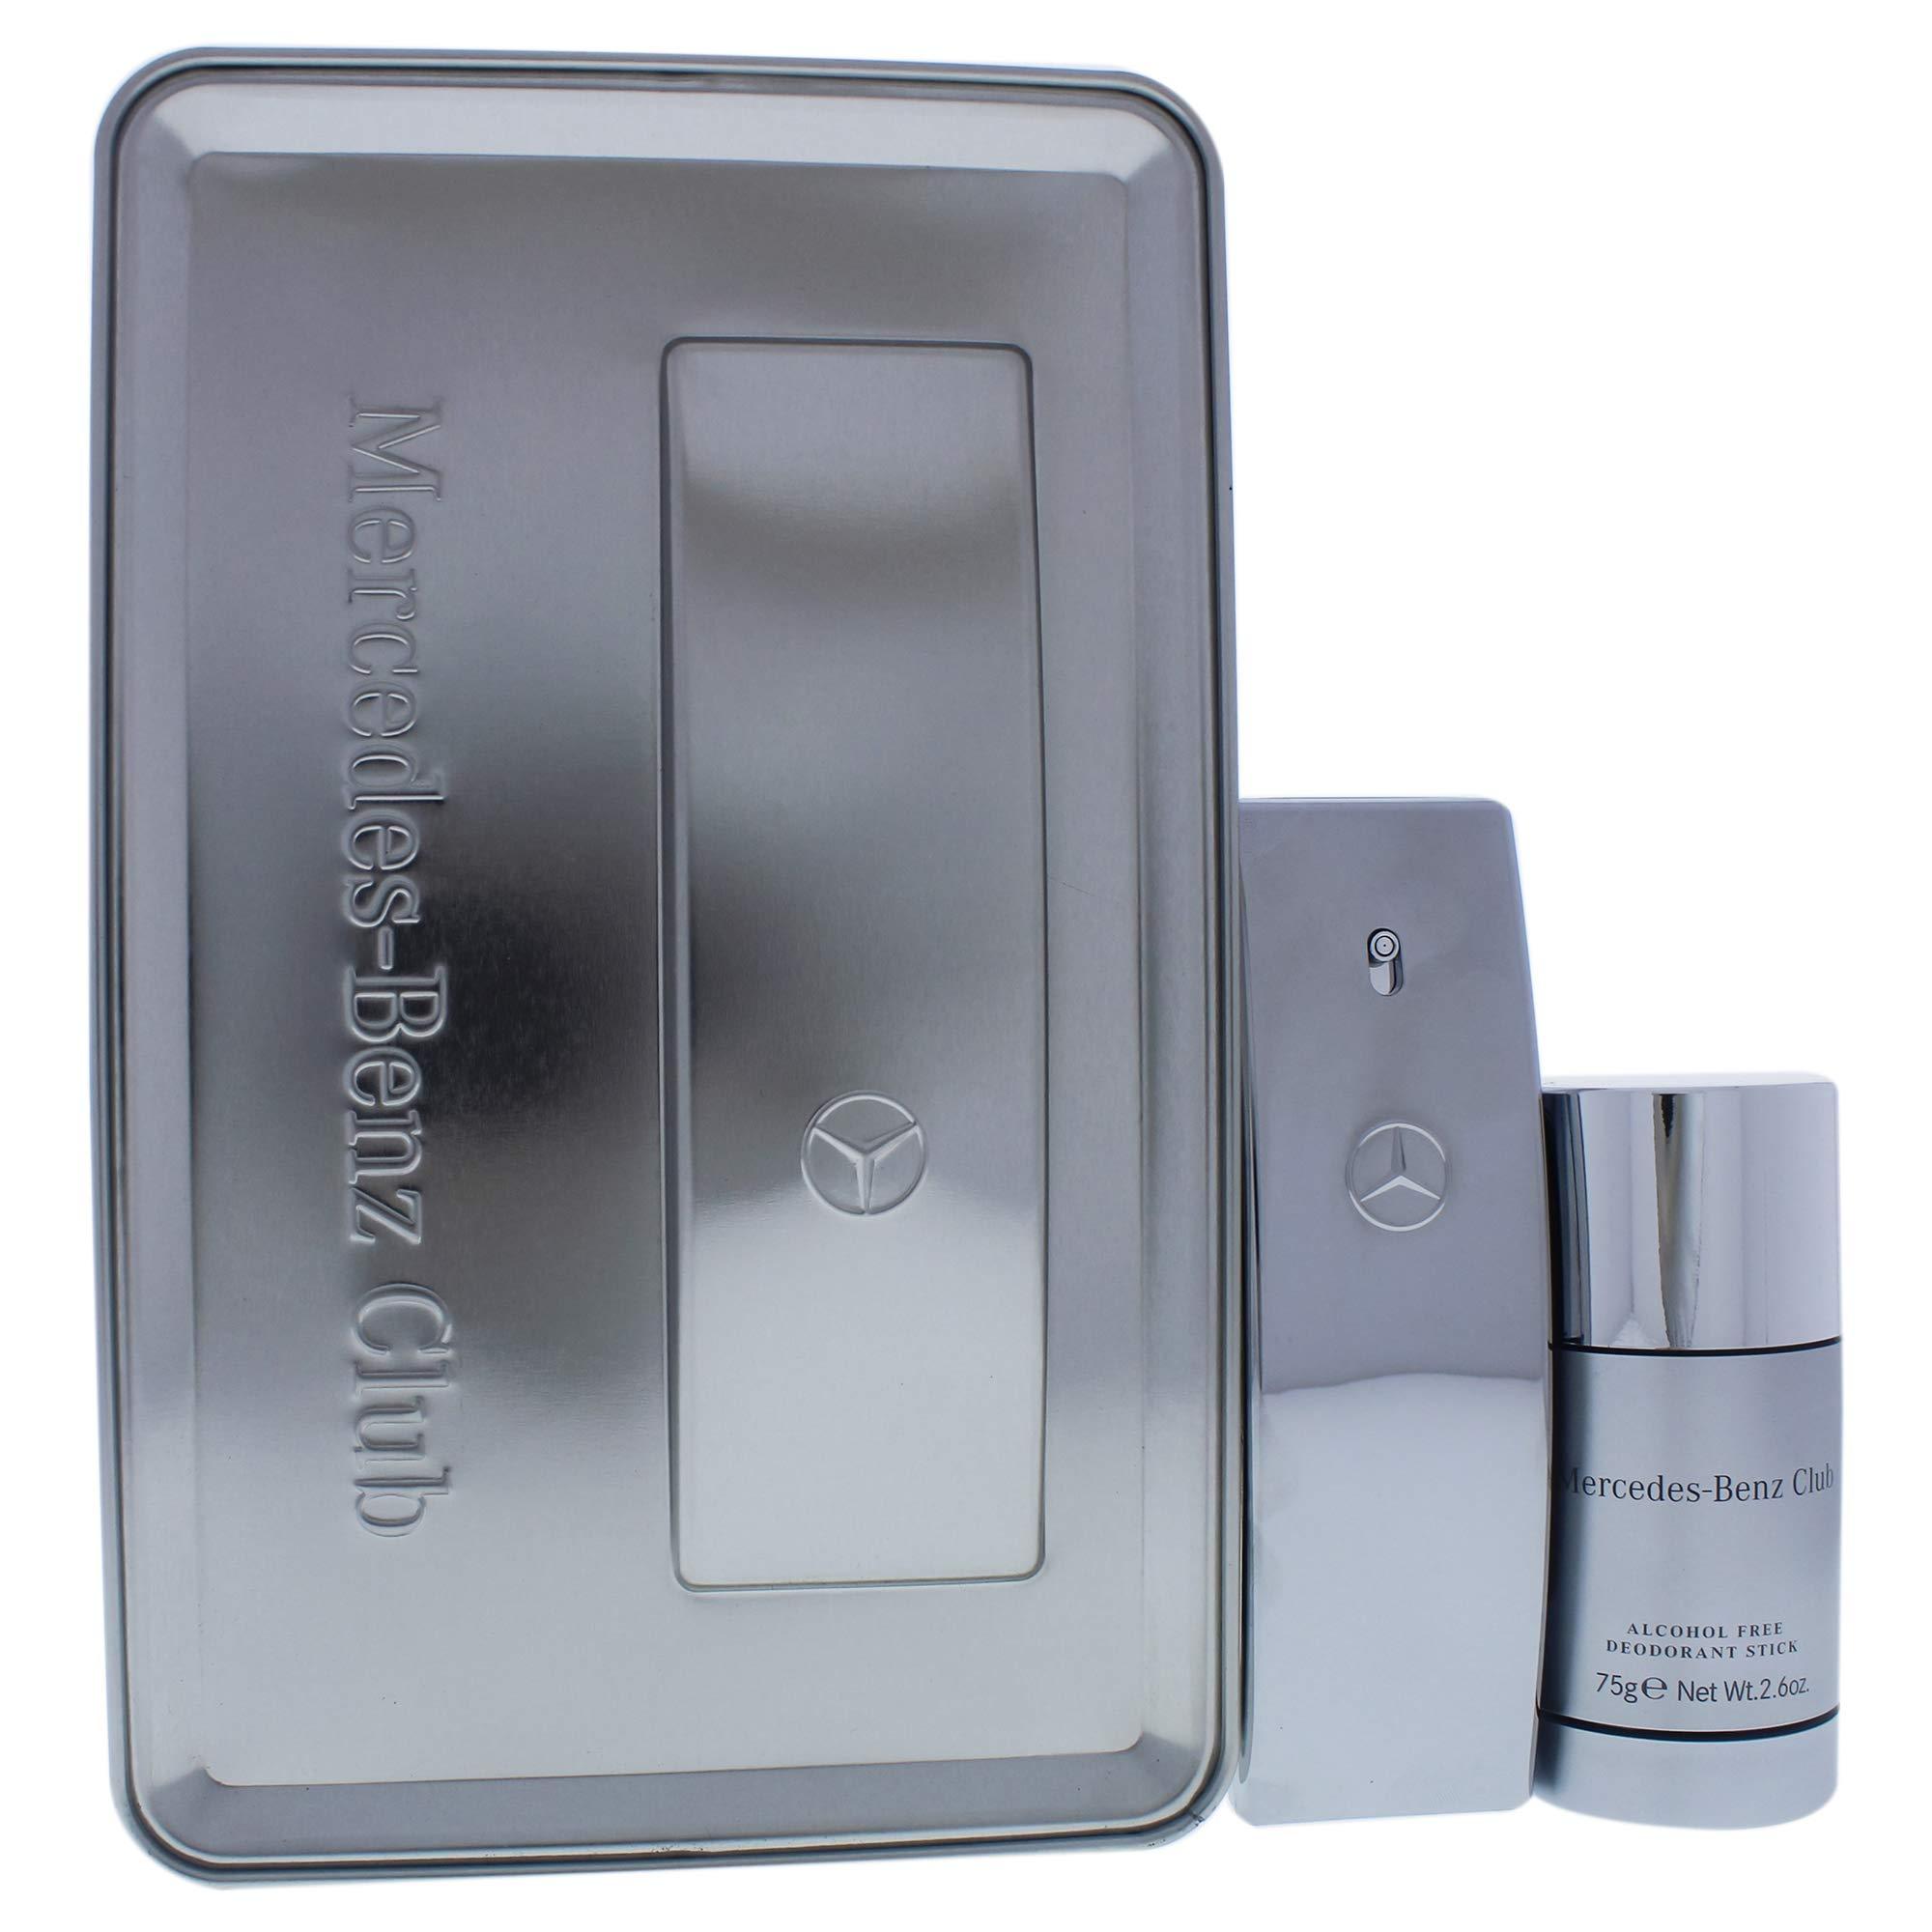 Mercedes-benz Mercedes-benz Club By Mercedes-benz for Men - 2 Pc Gift Set 1.7oz Edt Spray, 2.6oz Alcohol-free Deodorant Stick, 2count